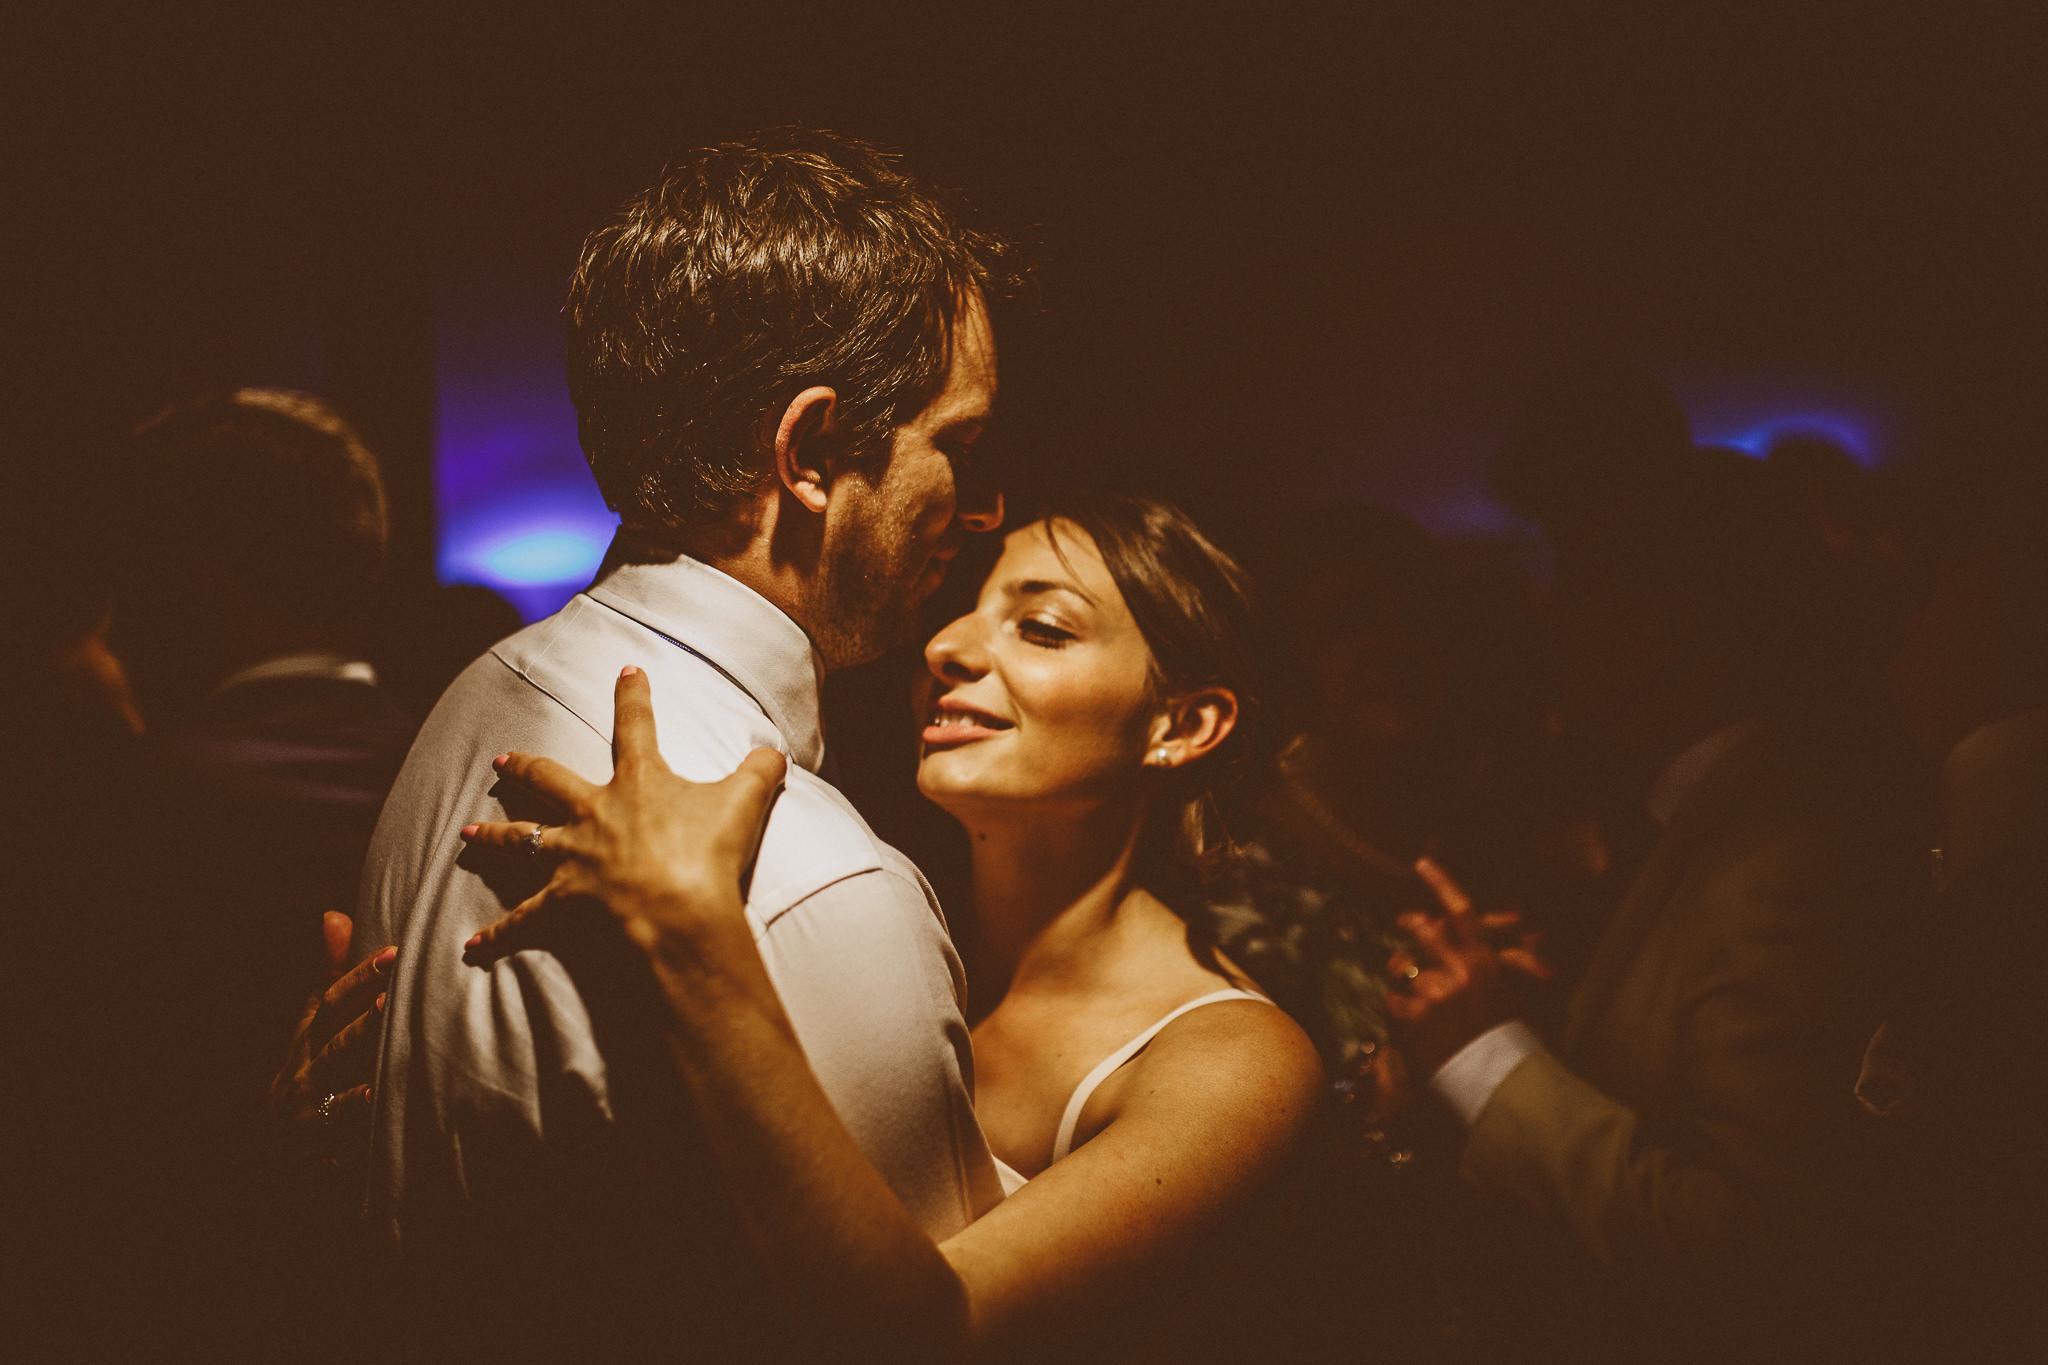 paul-marbrook-Gaynes-Park Wedding-Photographer-90148